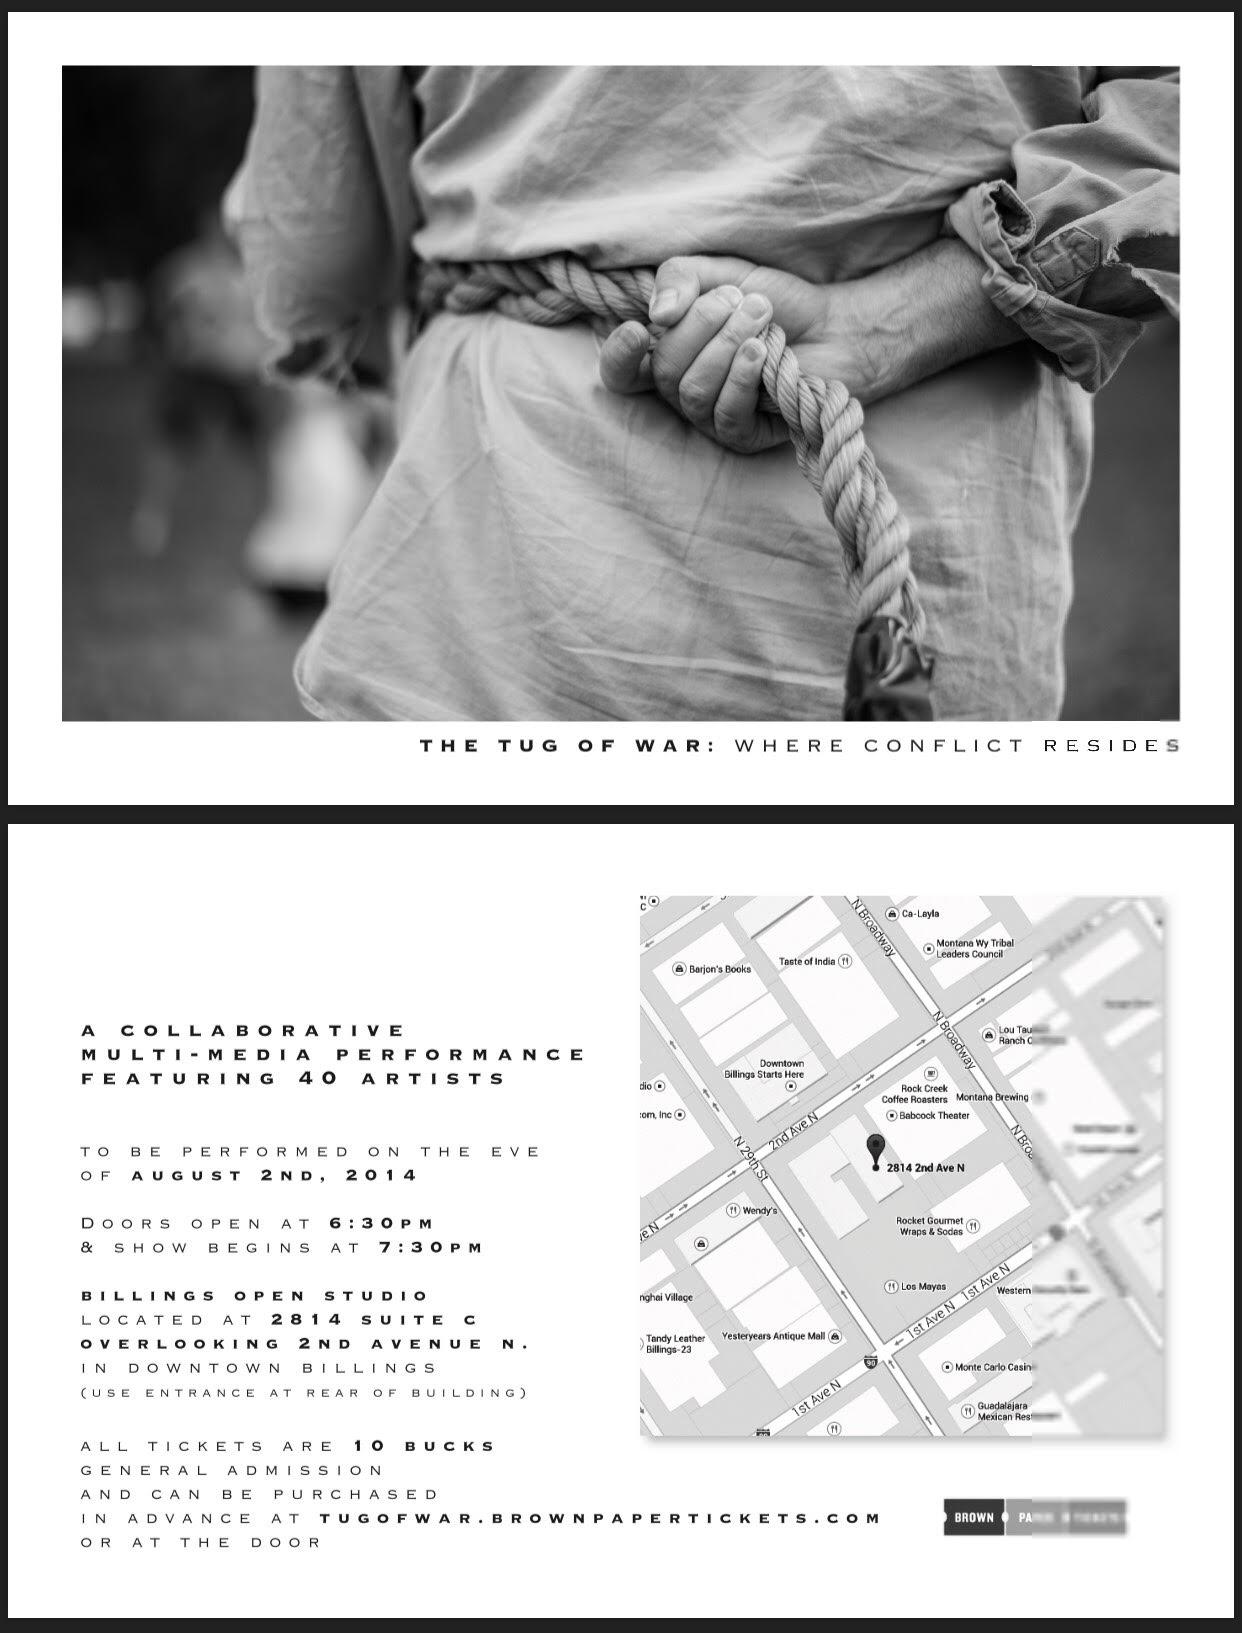 TugofWar_Postcard.jpg